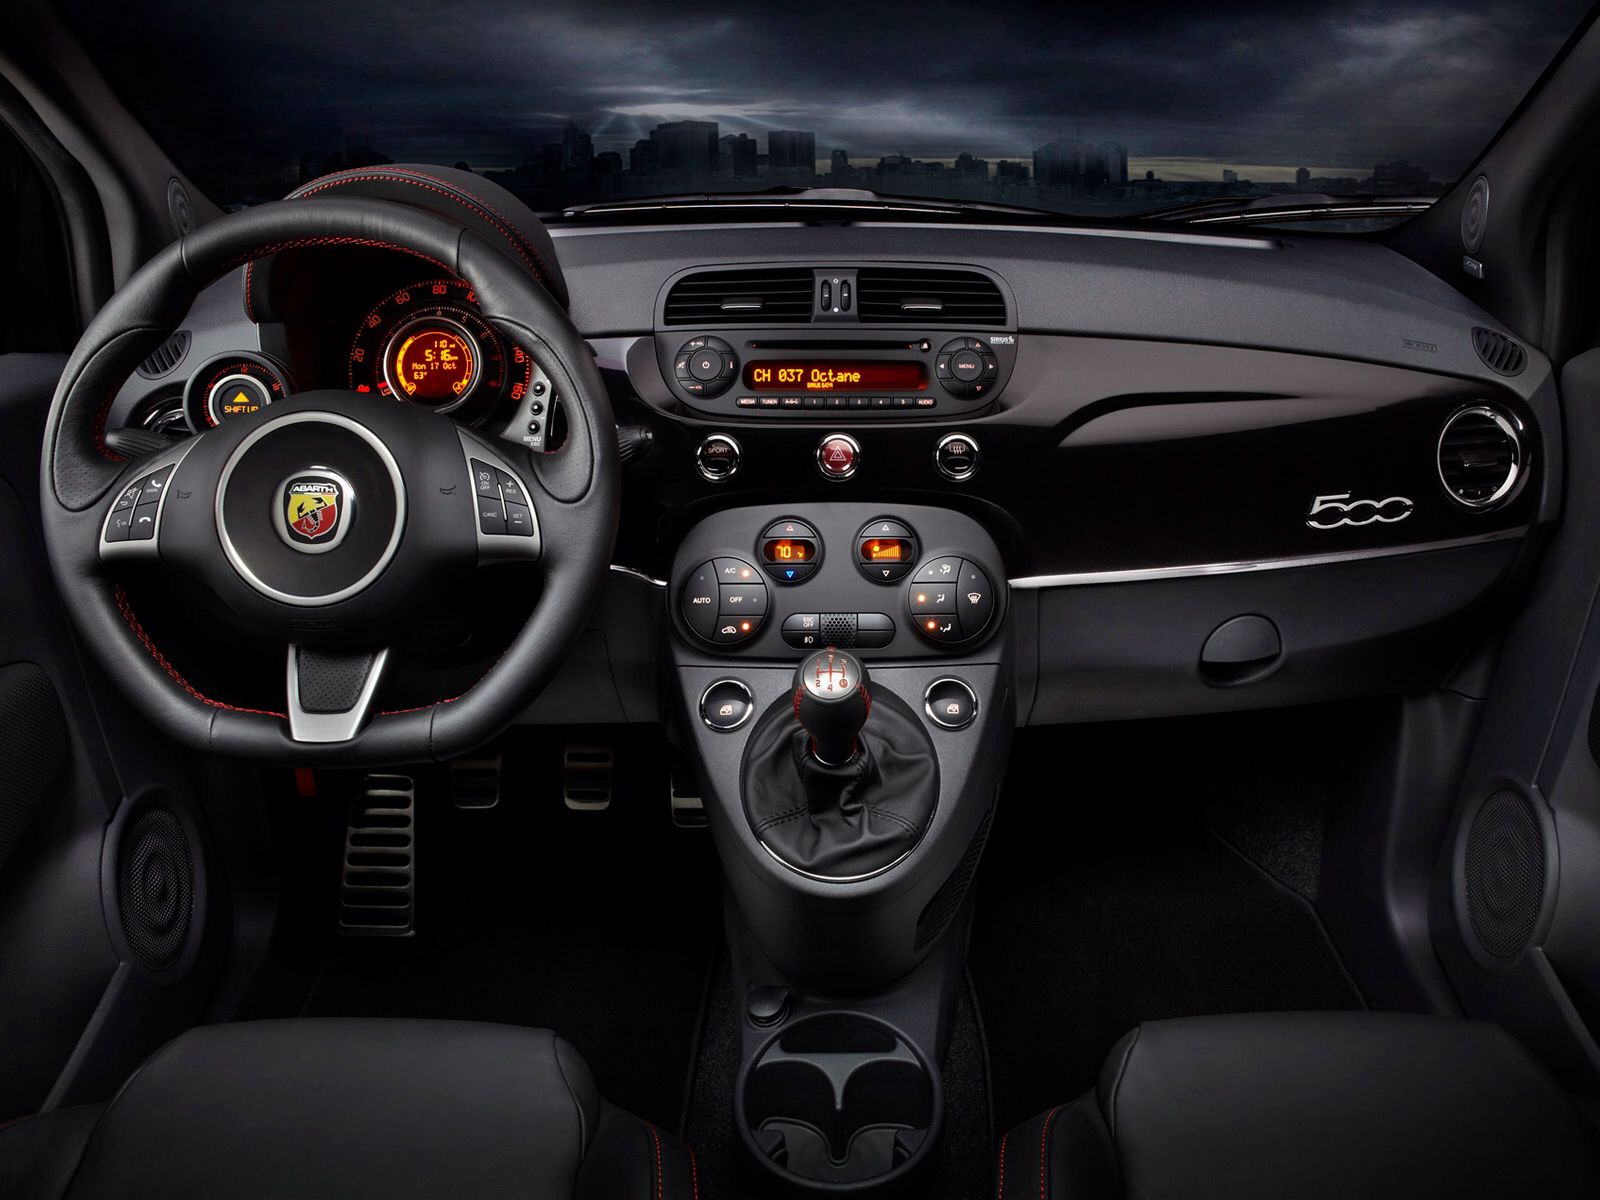 Fiat 500 Abarth Interior Autos Fiat Fiat 500 Autos Y Motos